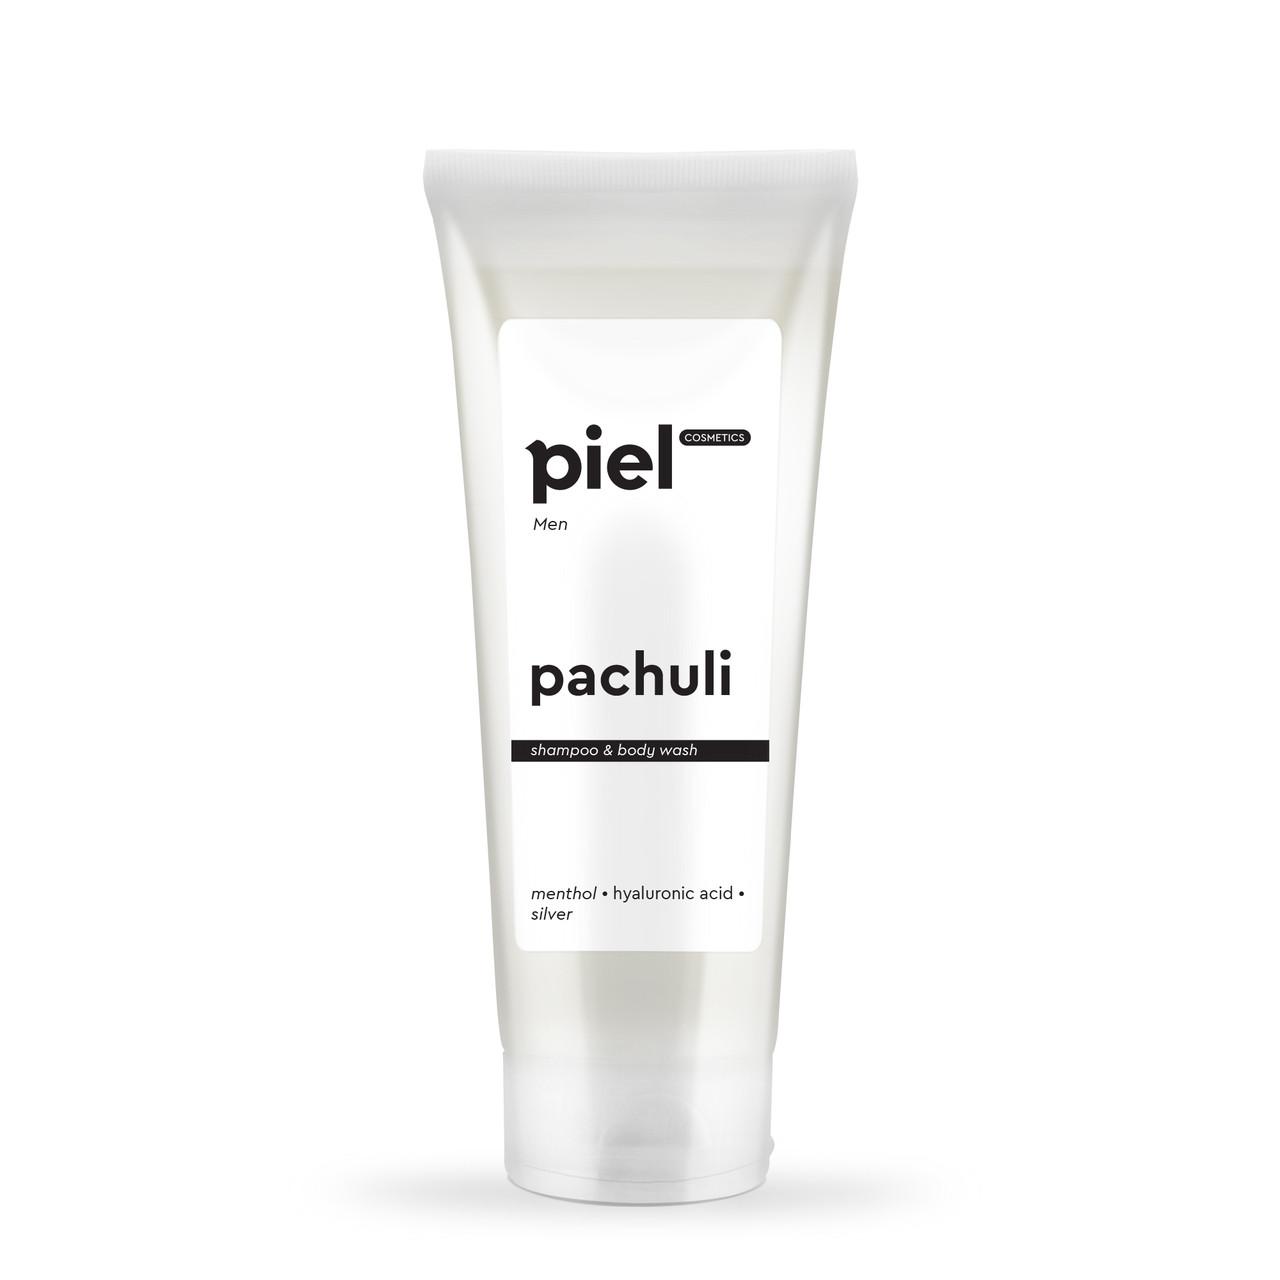 Shampoo-Gel Pachuli - Шампунь-гель Pachuli, 250 мл